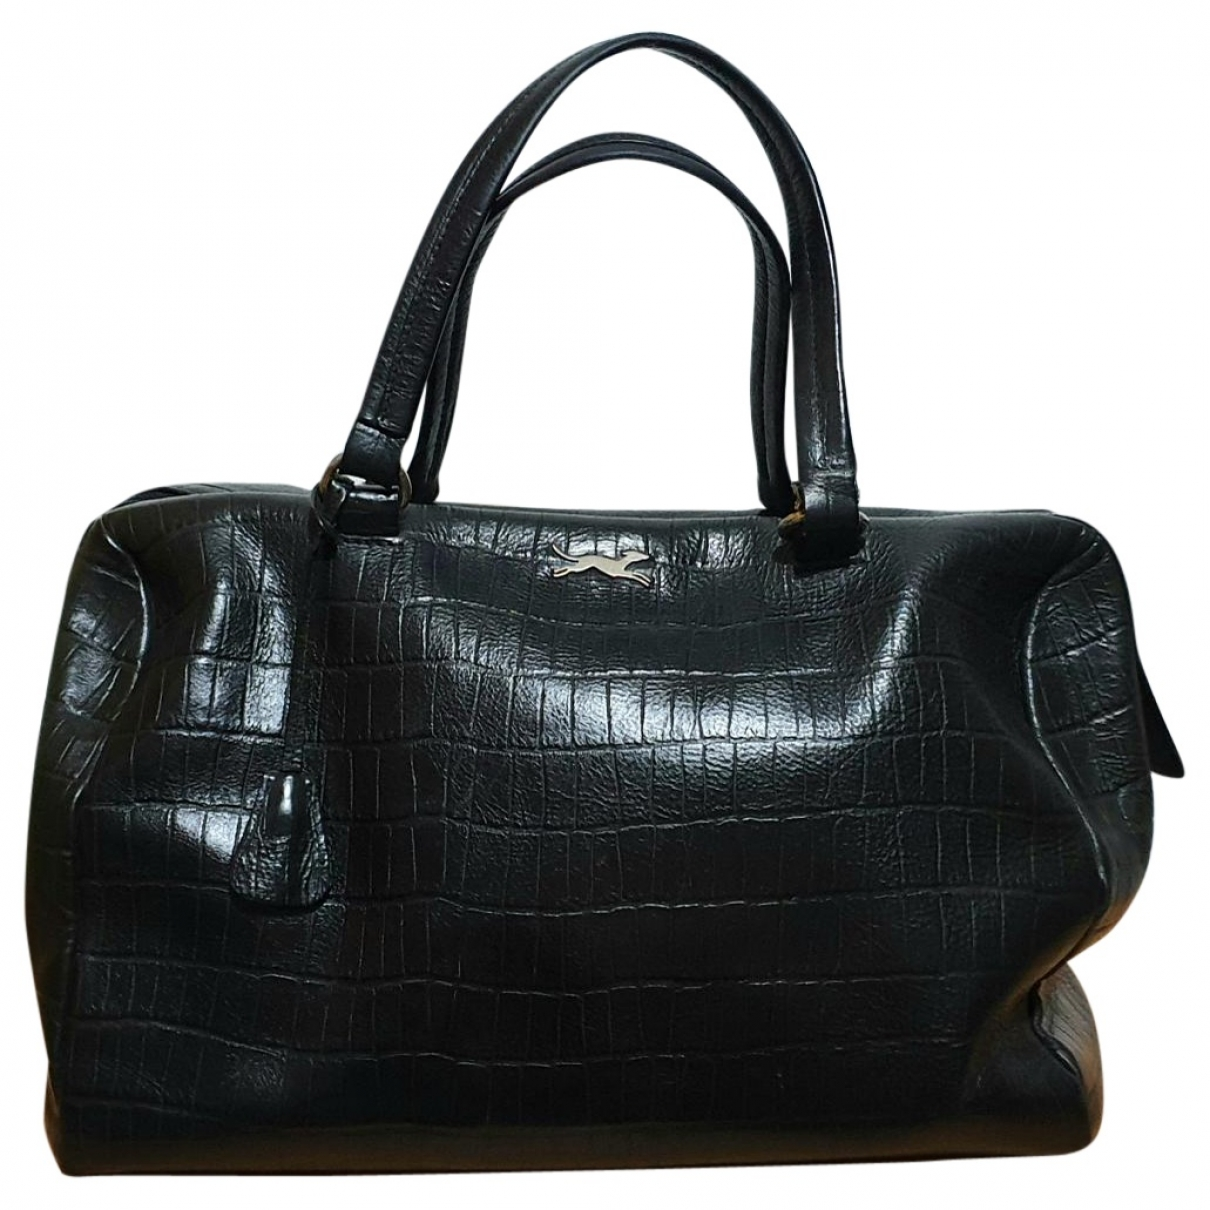 Bimba Y Lola \N Handtasche in  Schwarz Leder